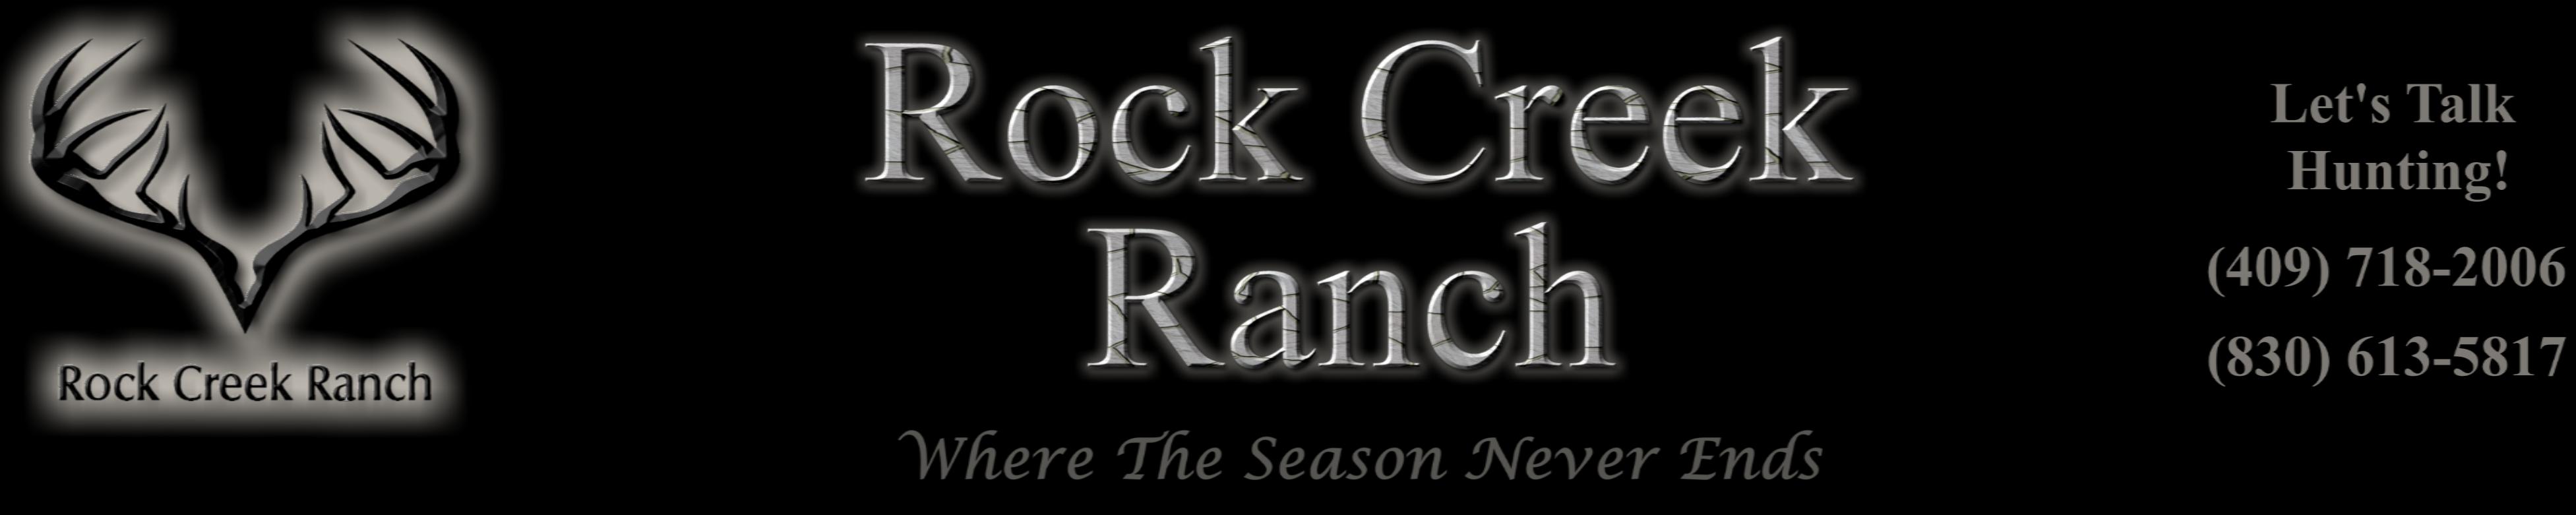 Rock Creek Ranch